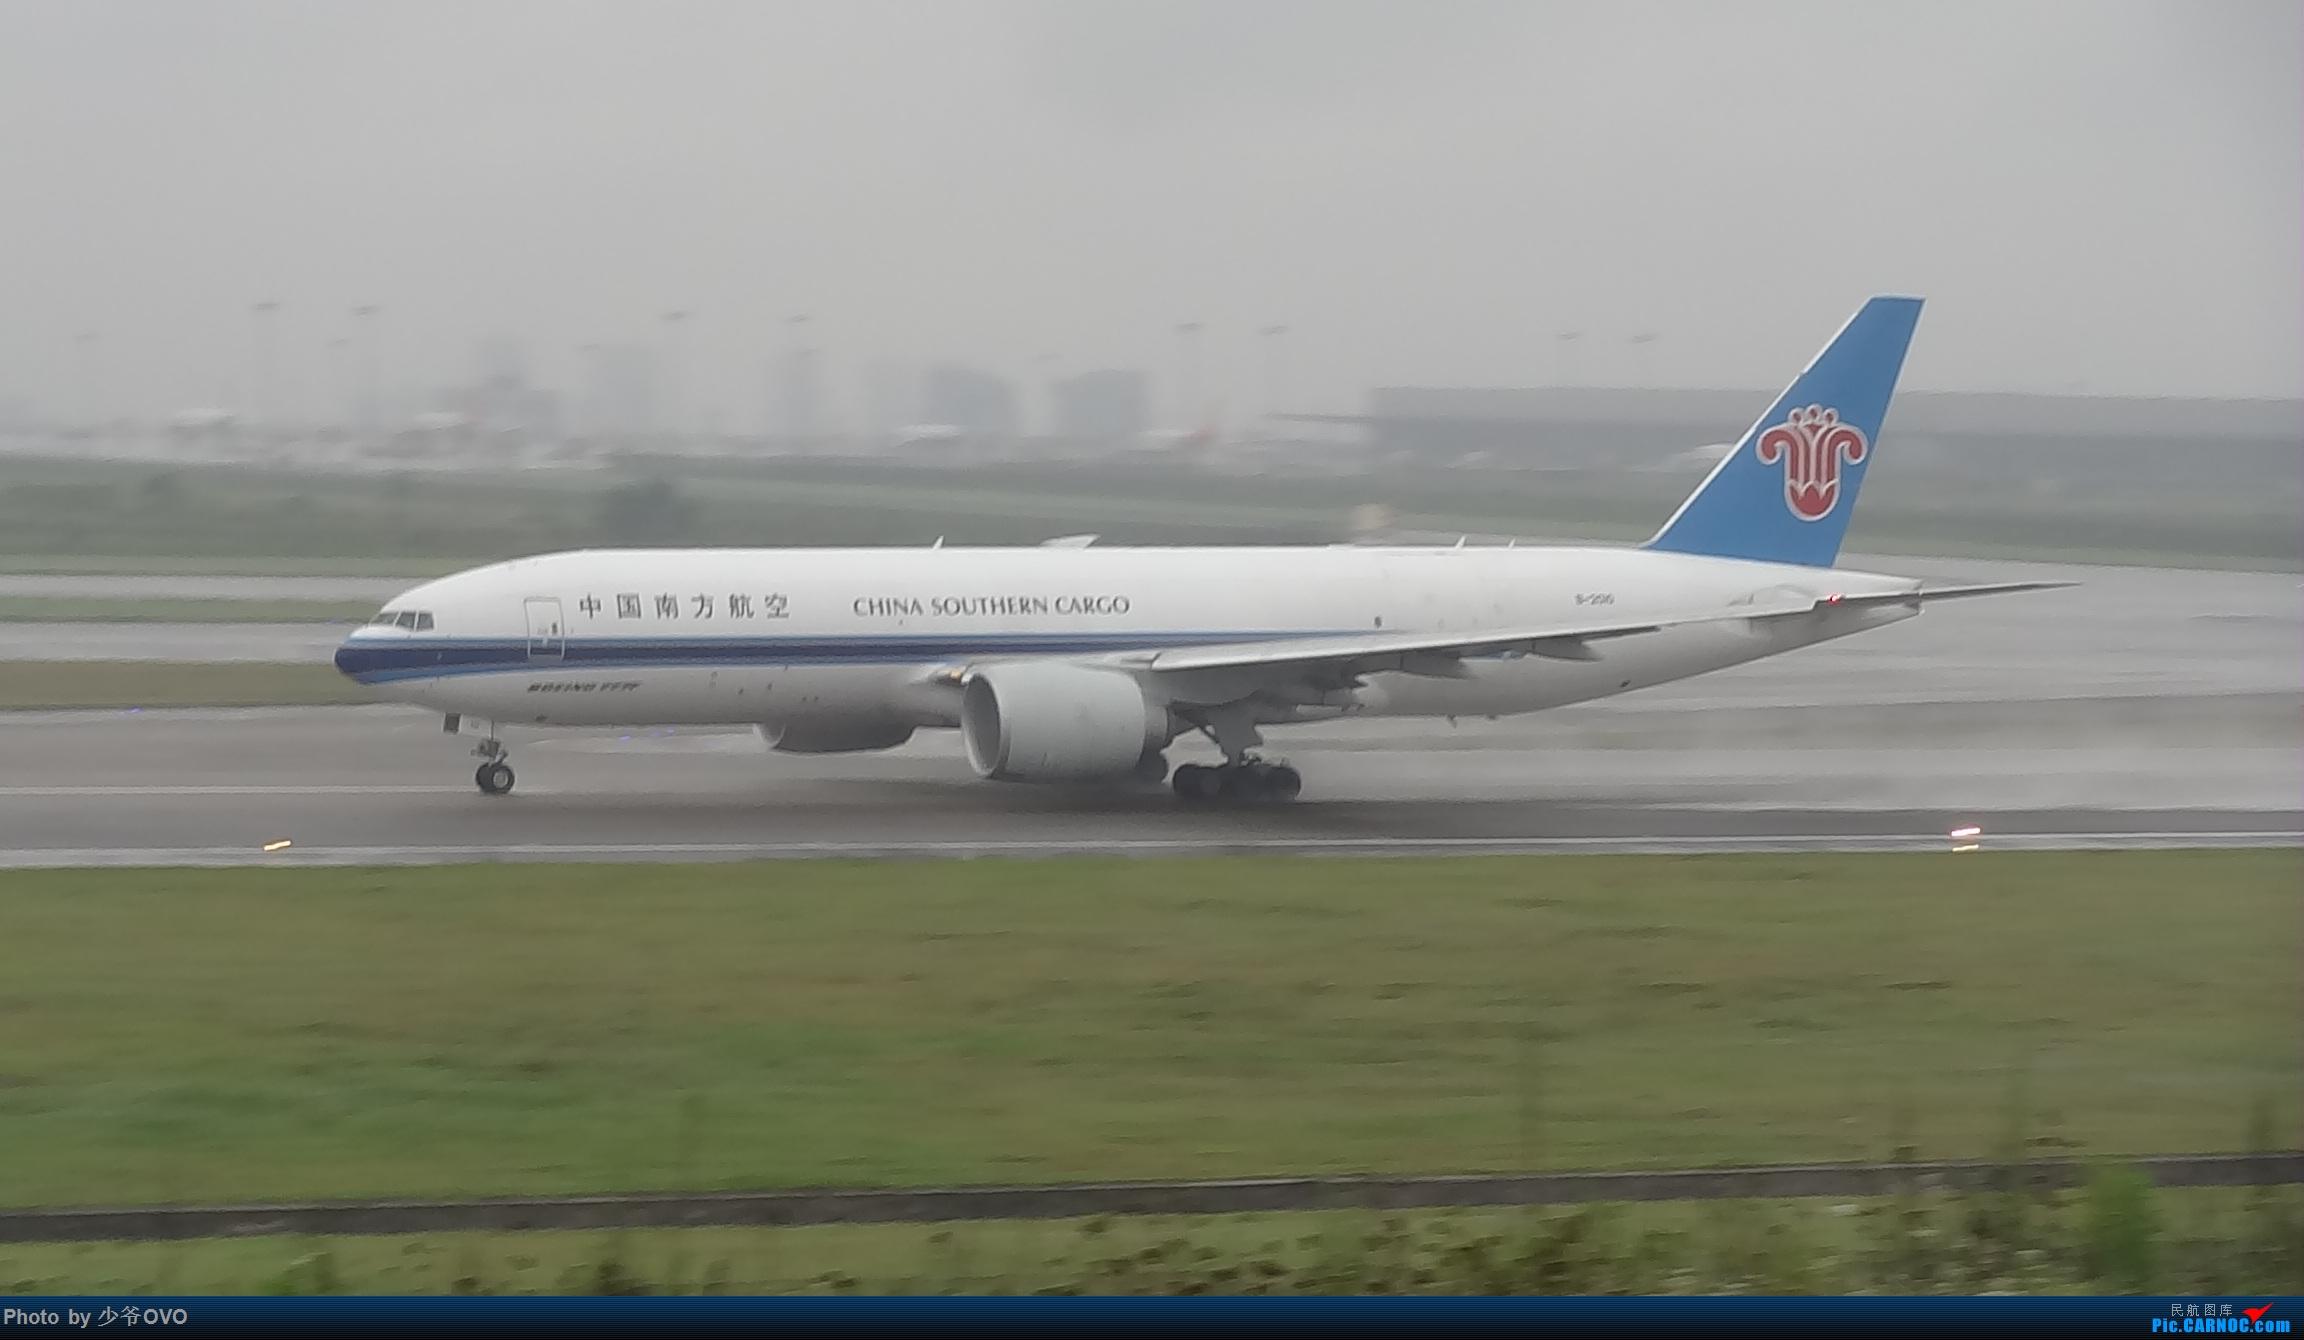 Re:[原创]CKG重庆江北机场拍机 ,中法建交50周年 BOEING 777F B-2010 中国重庆江北国际机场